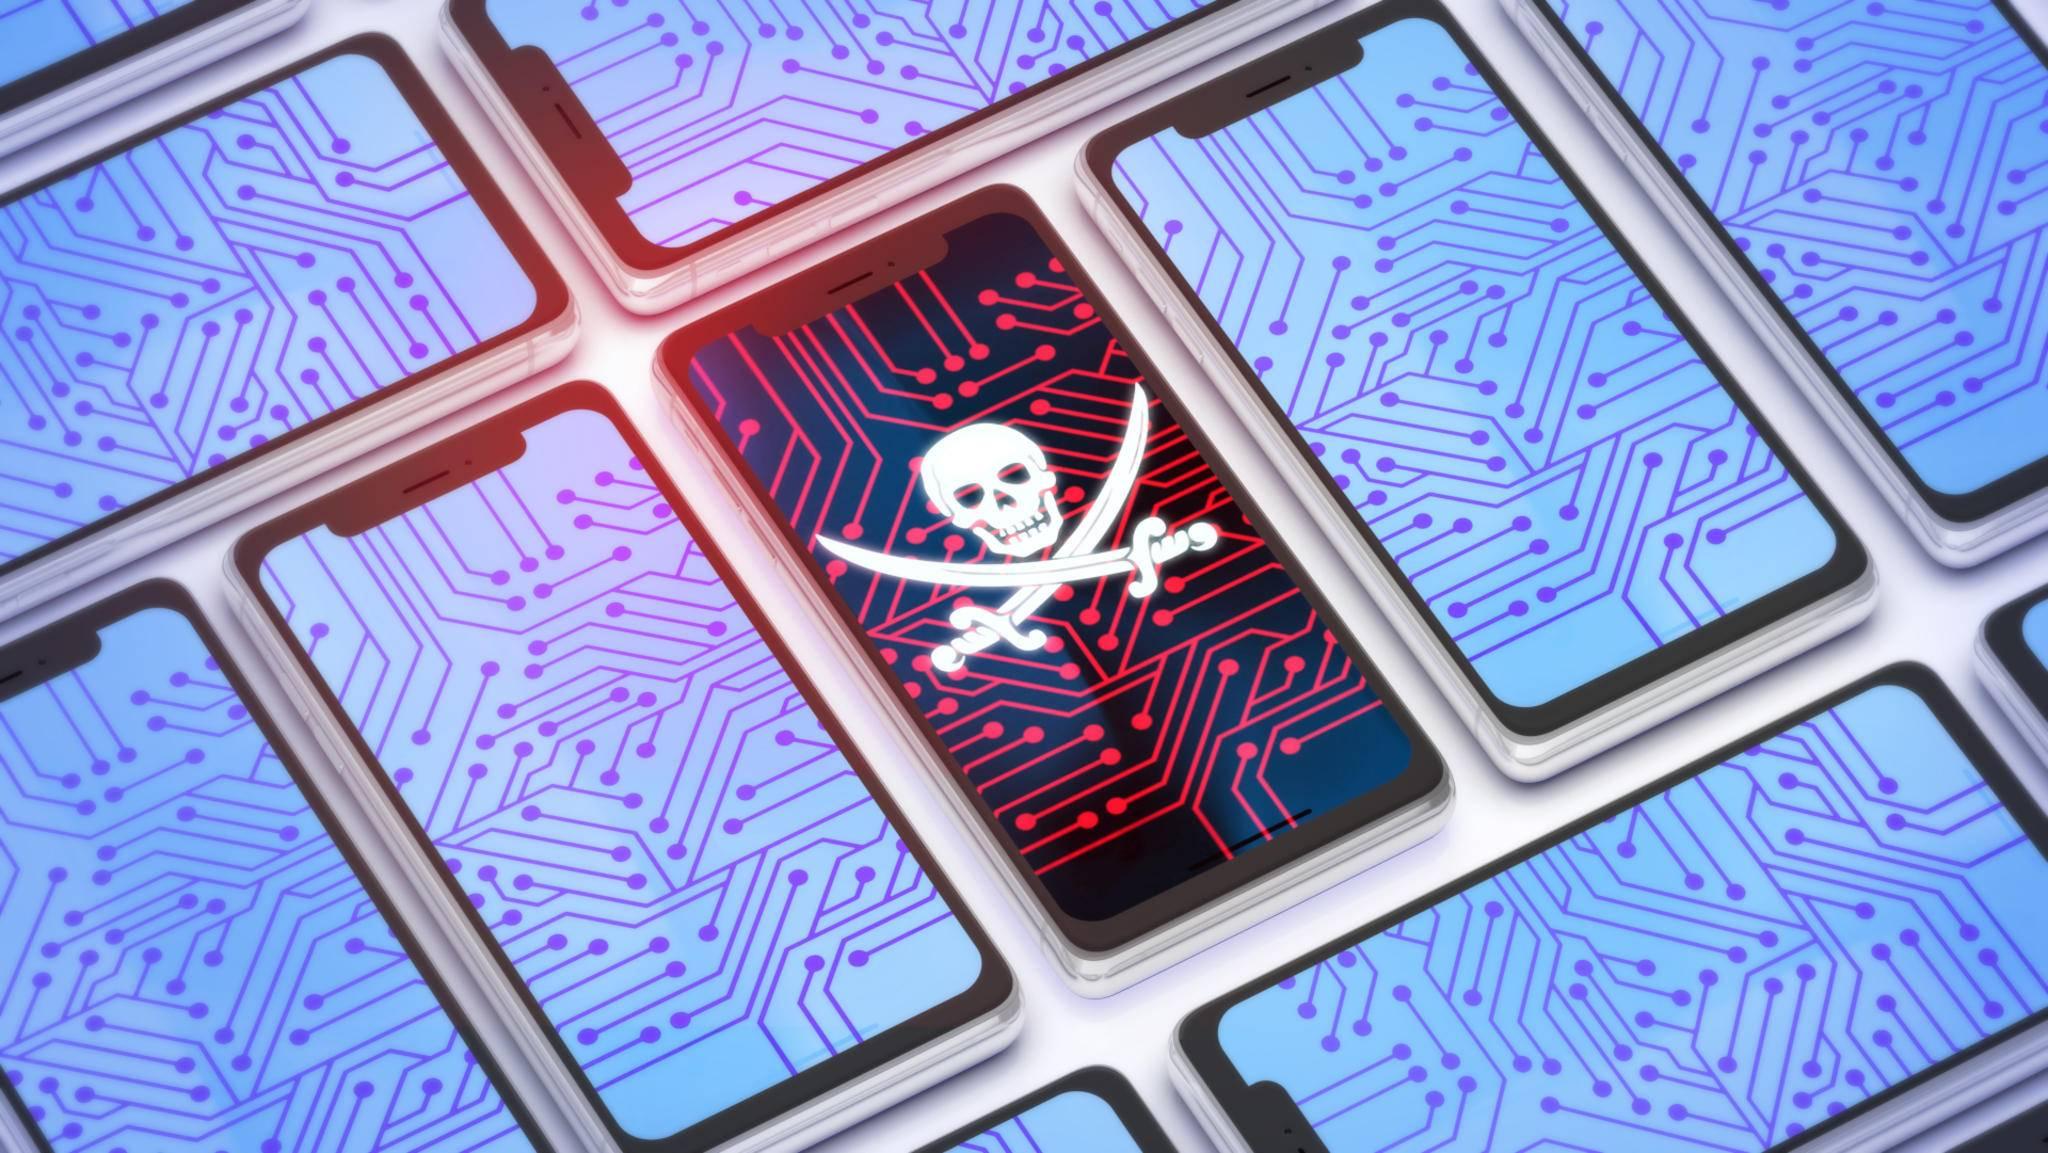 Ältere Android-Handys sind für Hacker-Angriffe anfälliger.